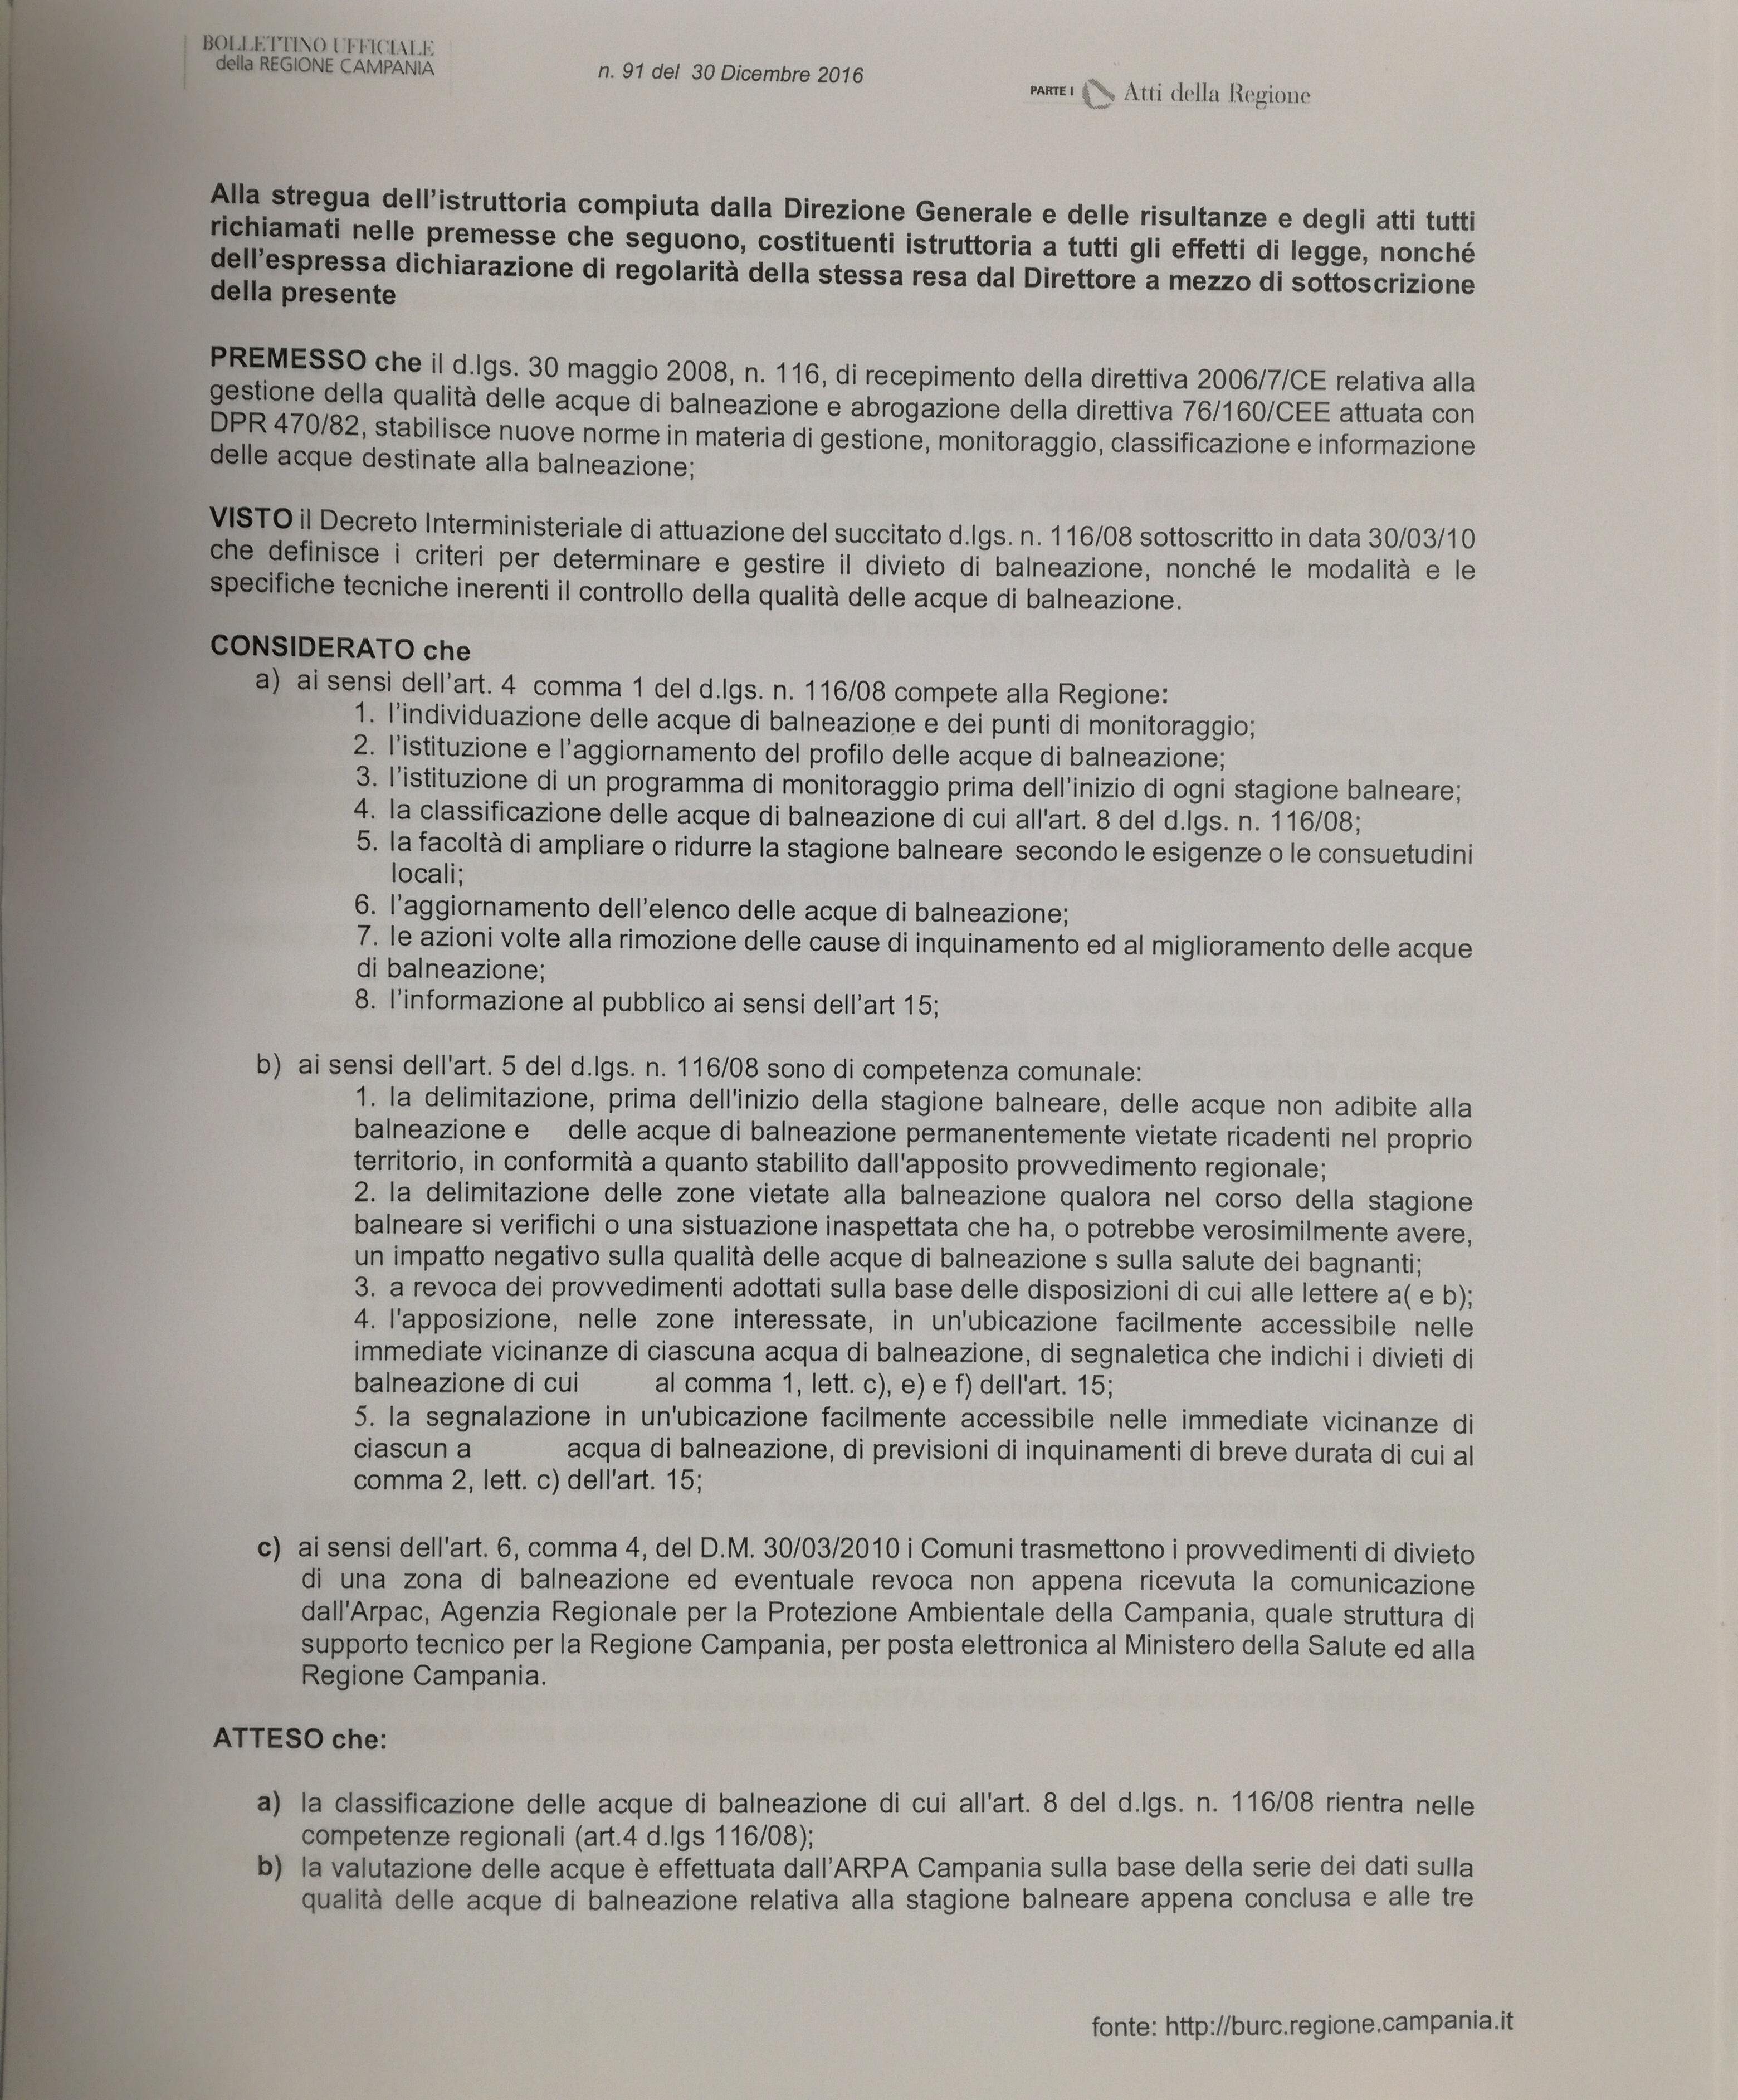 Balneabilitá-Delibera-Giunta Regionale-Campania-769-del-28-12-2016-3